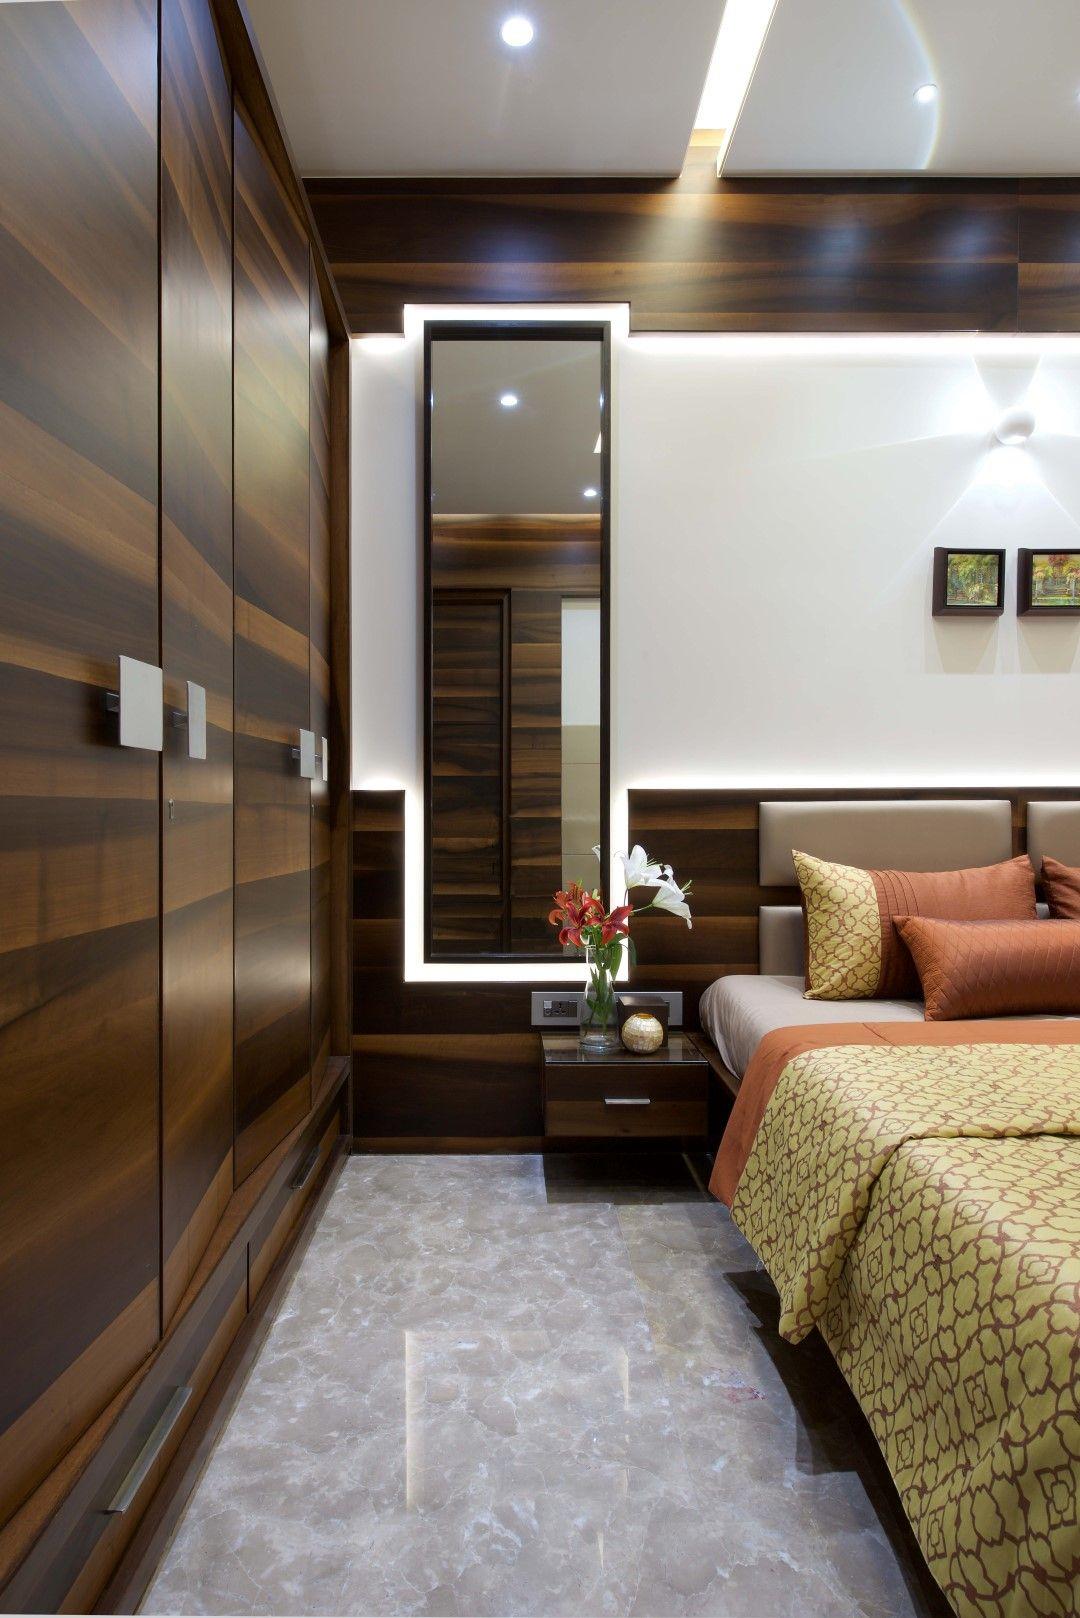 3 bhk wohndesign  bhk apartment interiors at yari road  yatak odası asya ve yatak